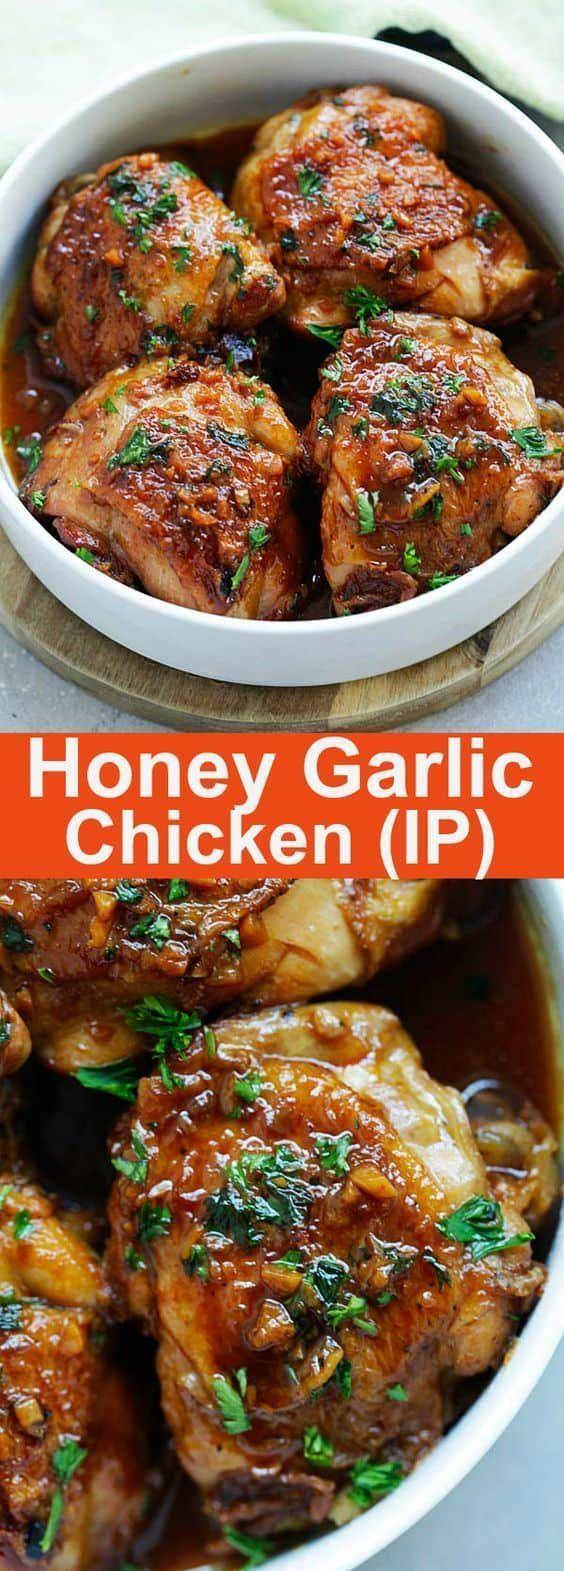 Honey Garlic Chicken Moist Tender Fall Off The Bone Chicken Thighs In Savory And Sweet Honey